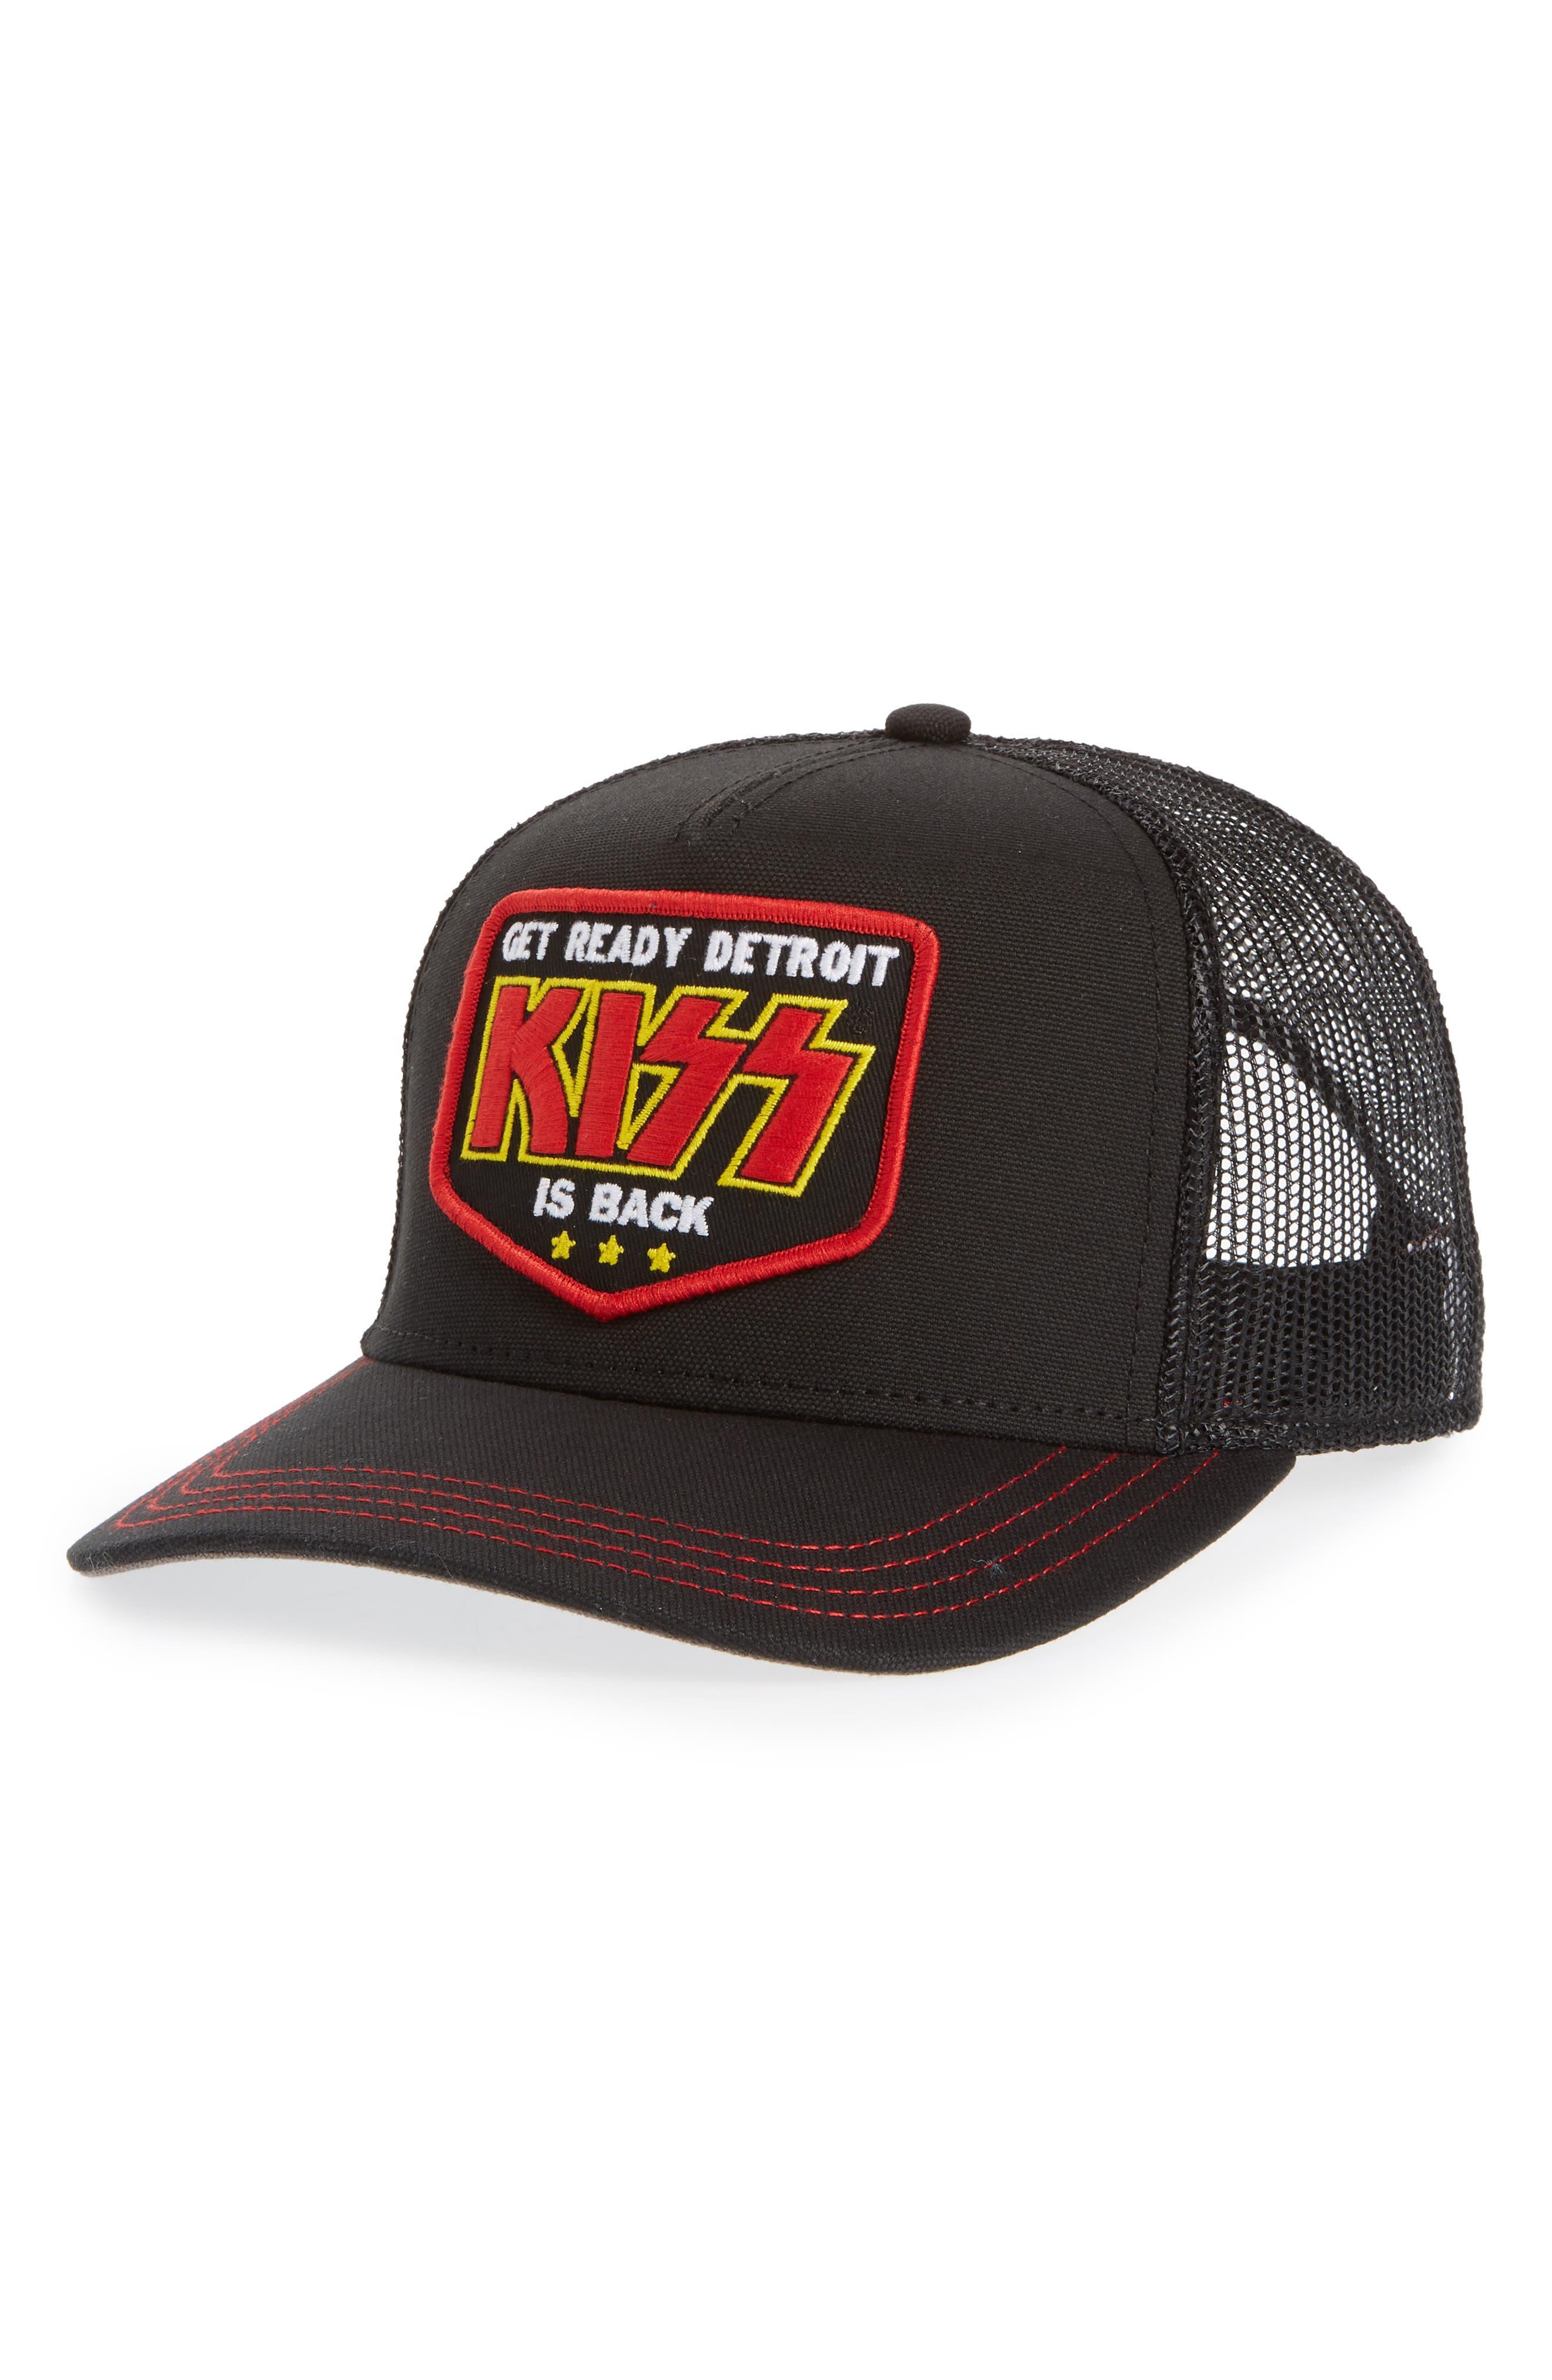 Valin KISS Trucker Hat,                             Main thumbnail 1, color,                             001